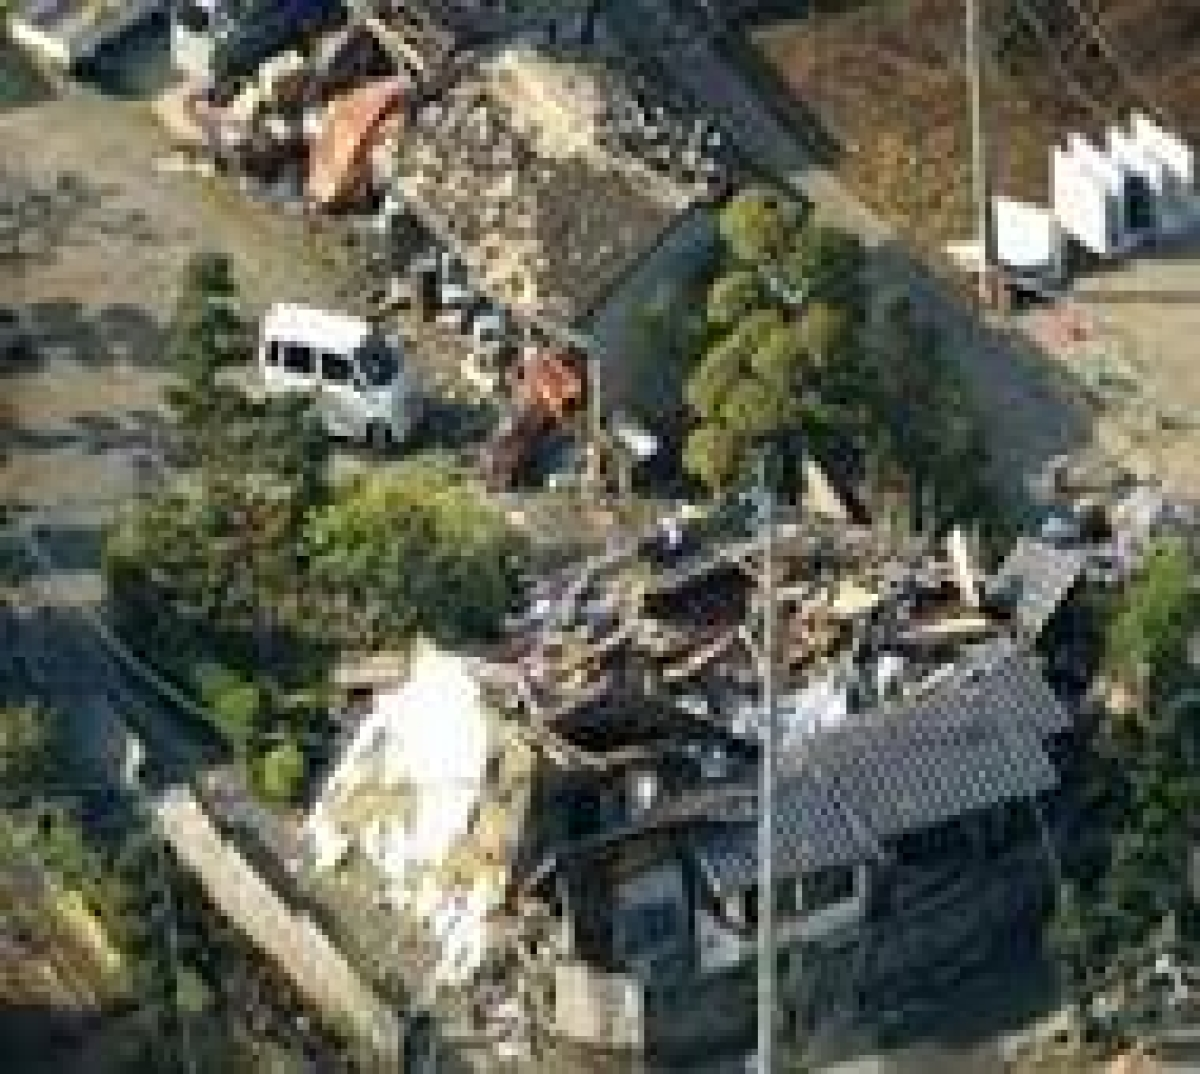 Rescuers scramble for survivors after deadly quake hits Japan